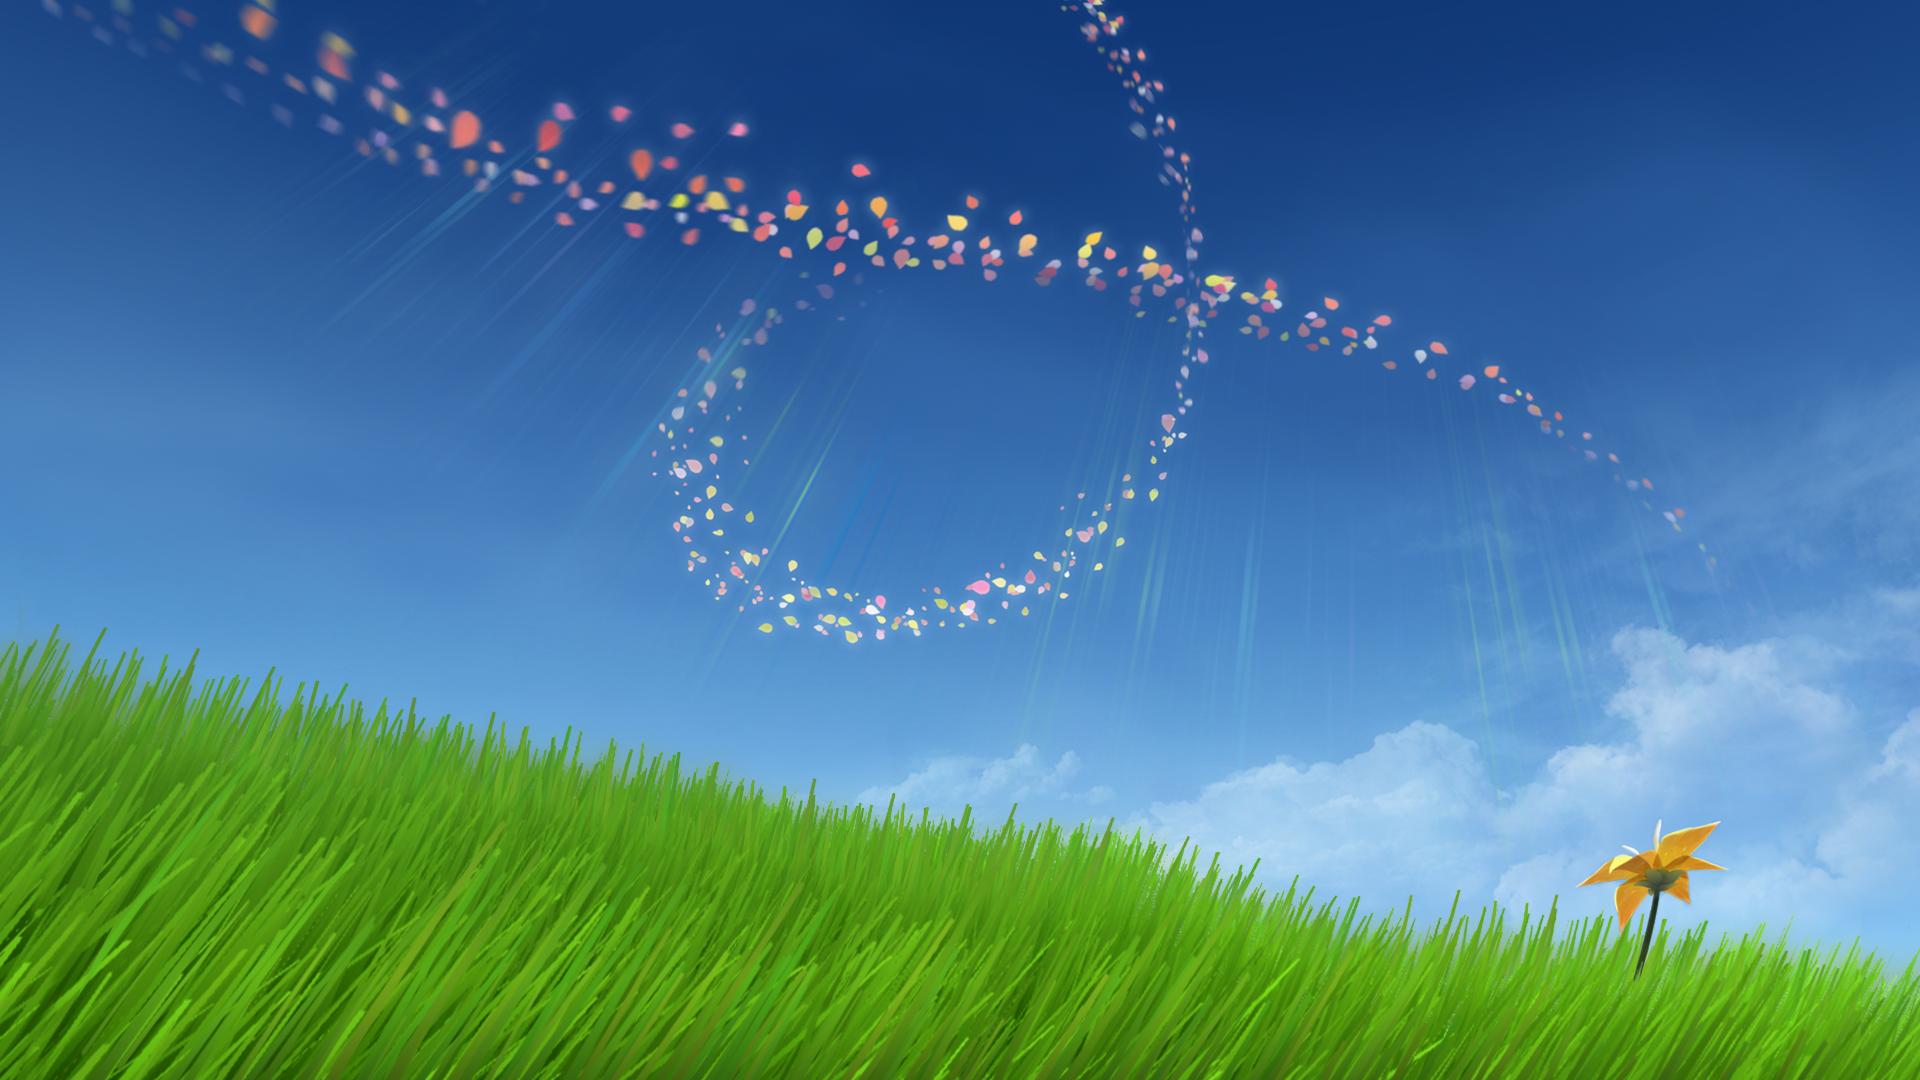 Flower Game wallpaper 1920x1080 78882 1920x1080